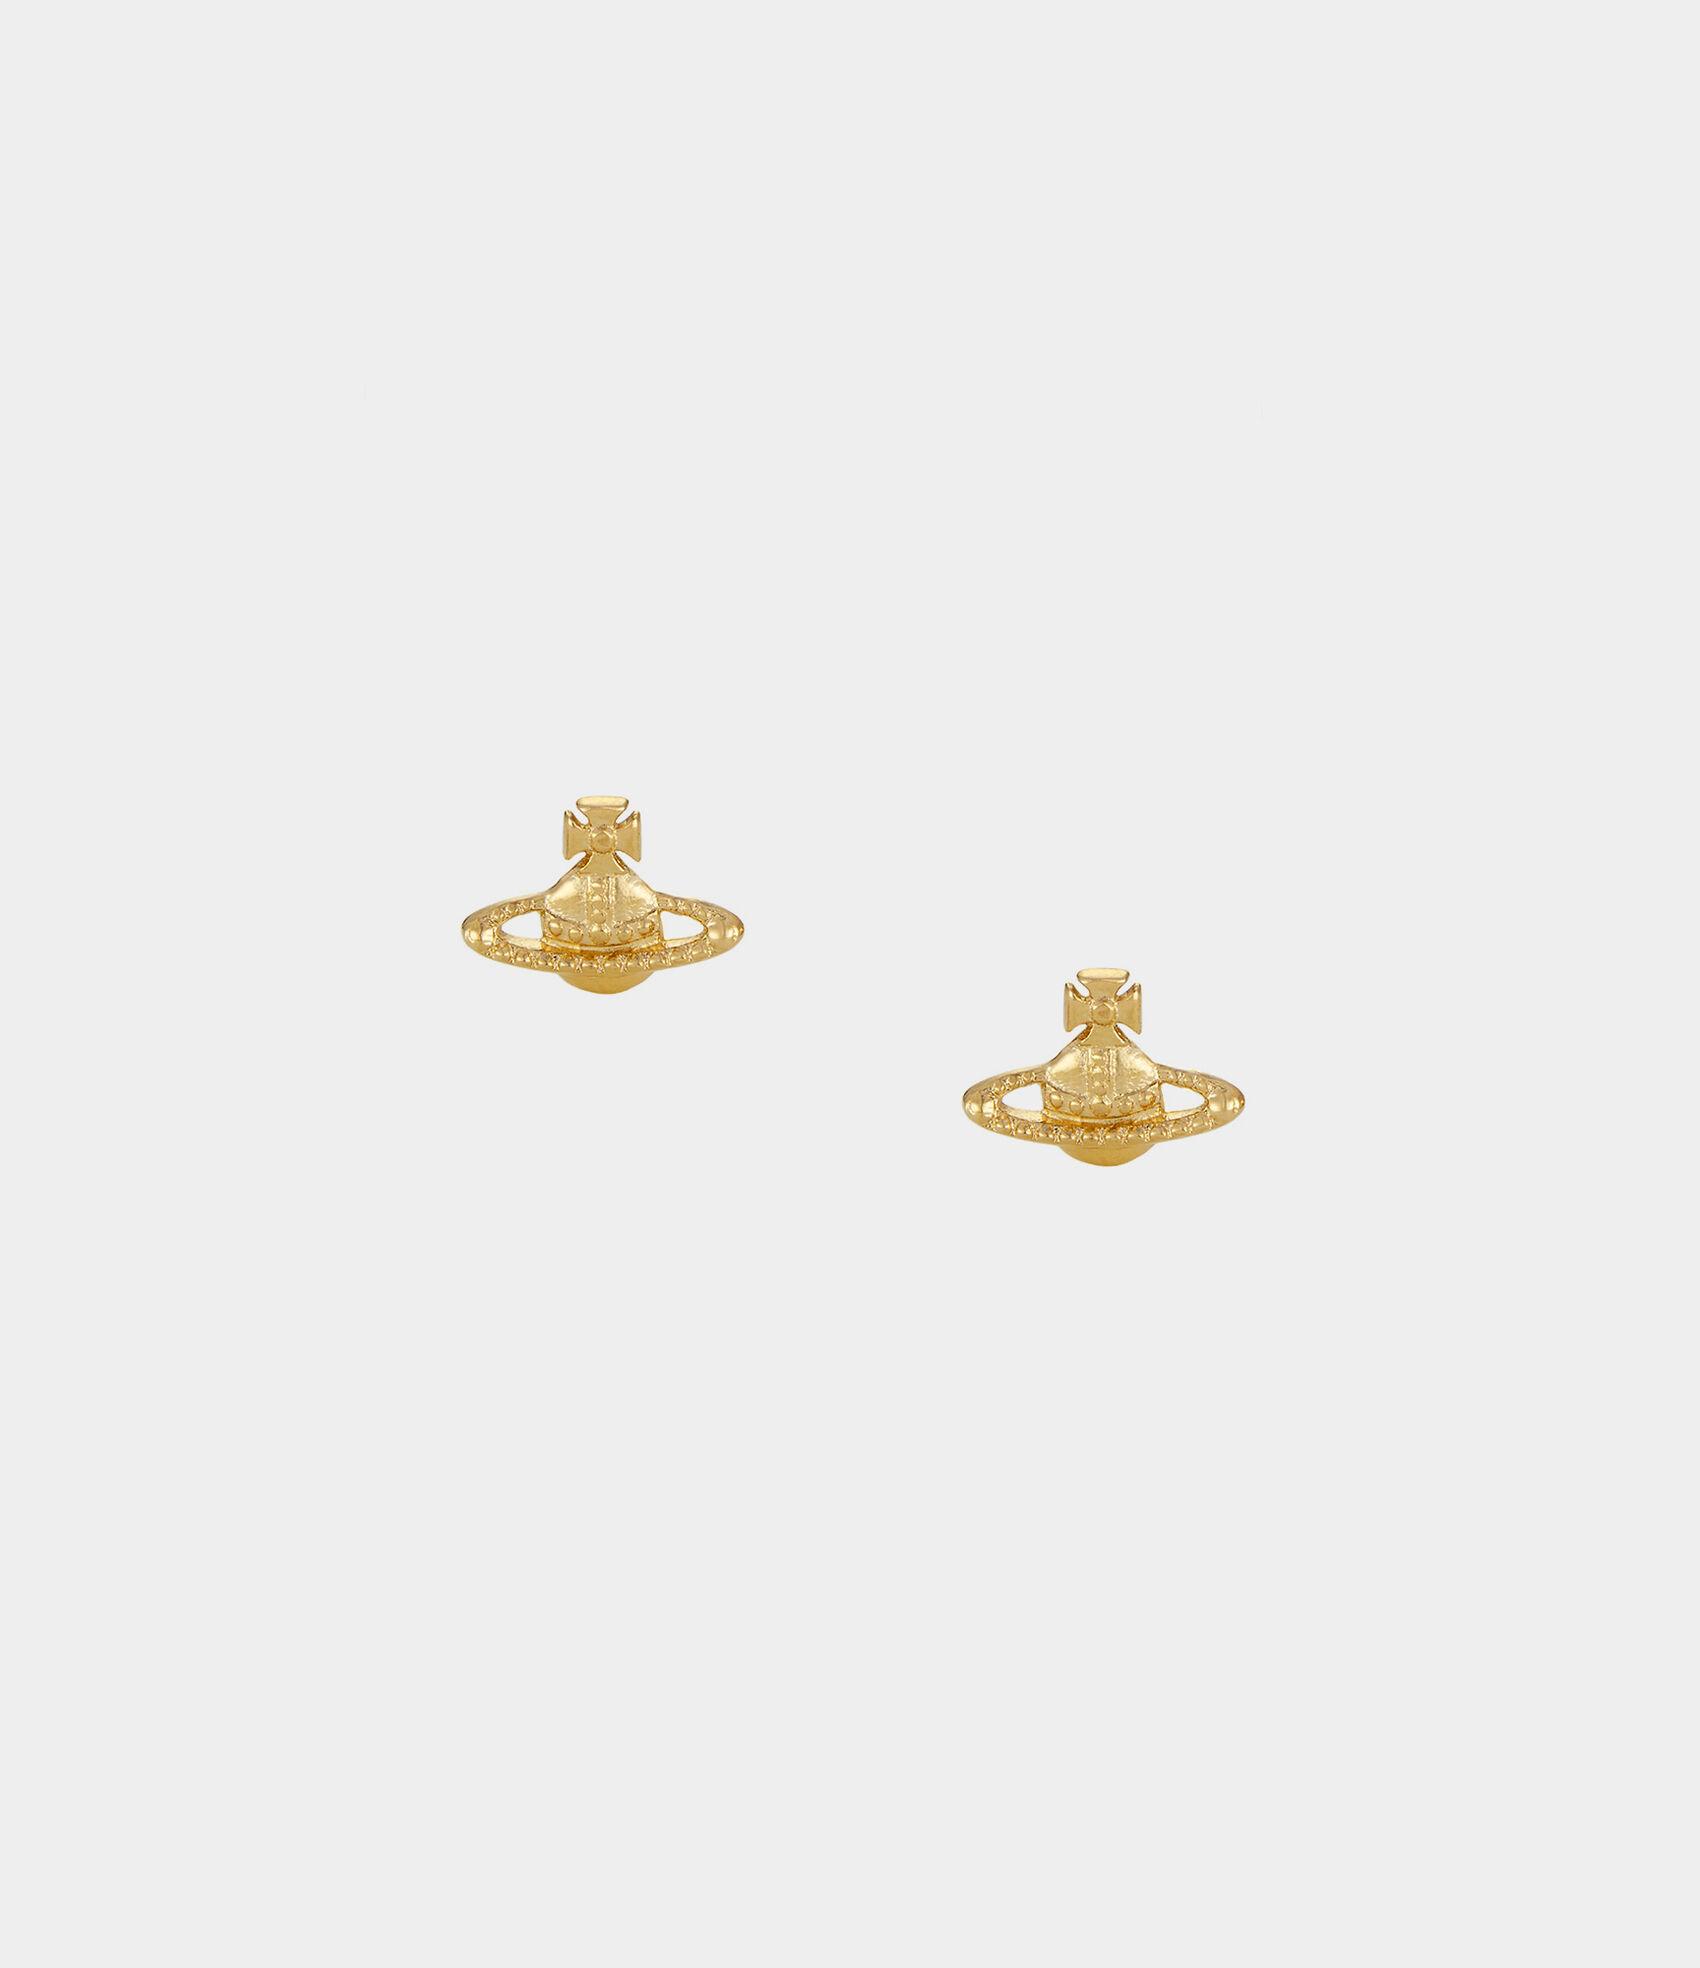 f8bc2679c Vivienne Westwood Farah Earrings Uk - The Best Produck Of Earring